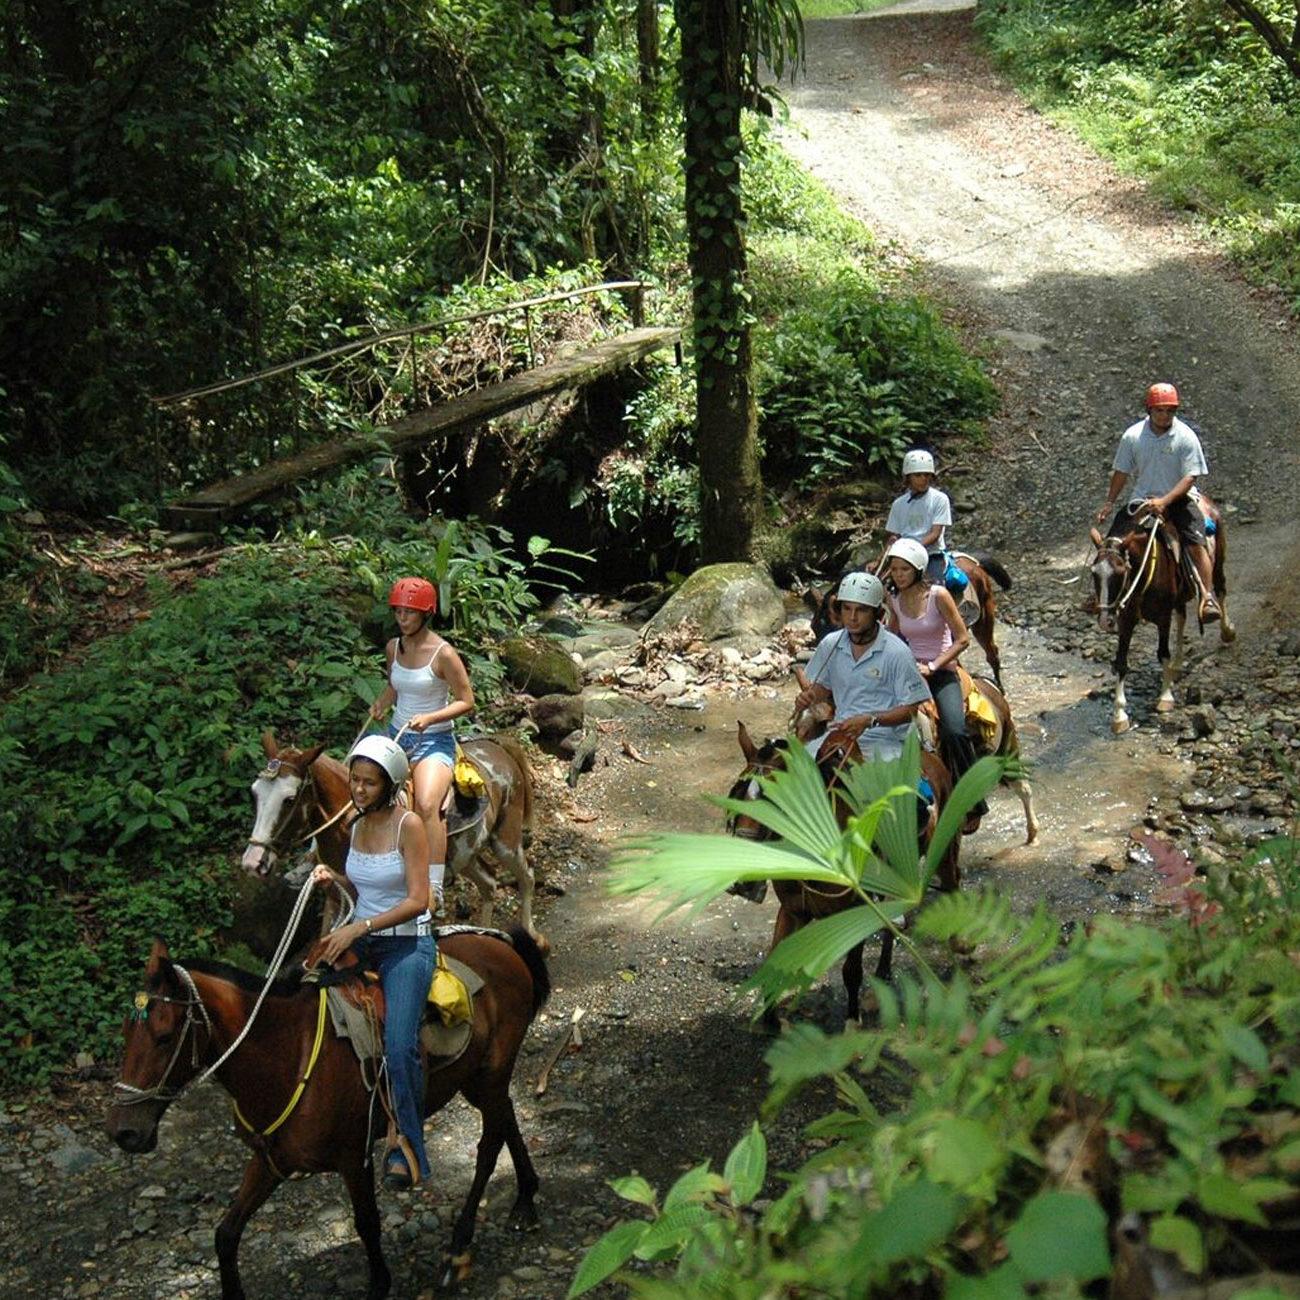 tours-horseback-riding